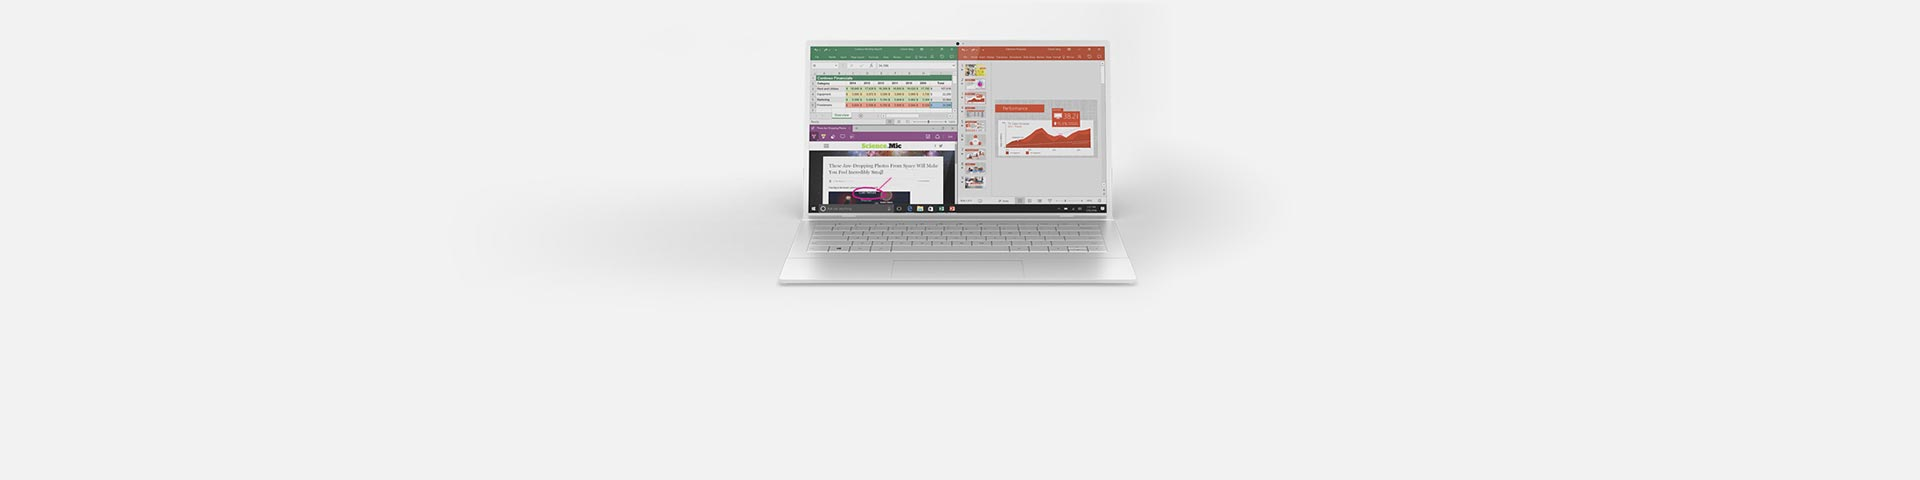 Laptop z aplikacjami Office